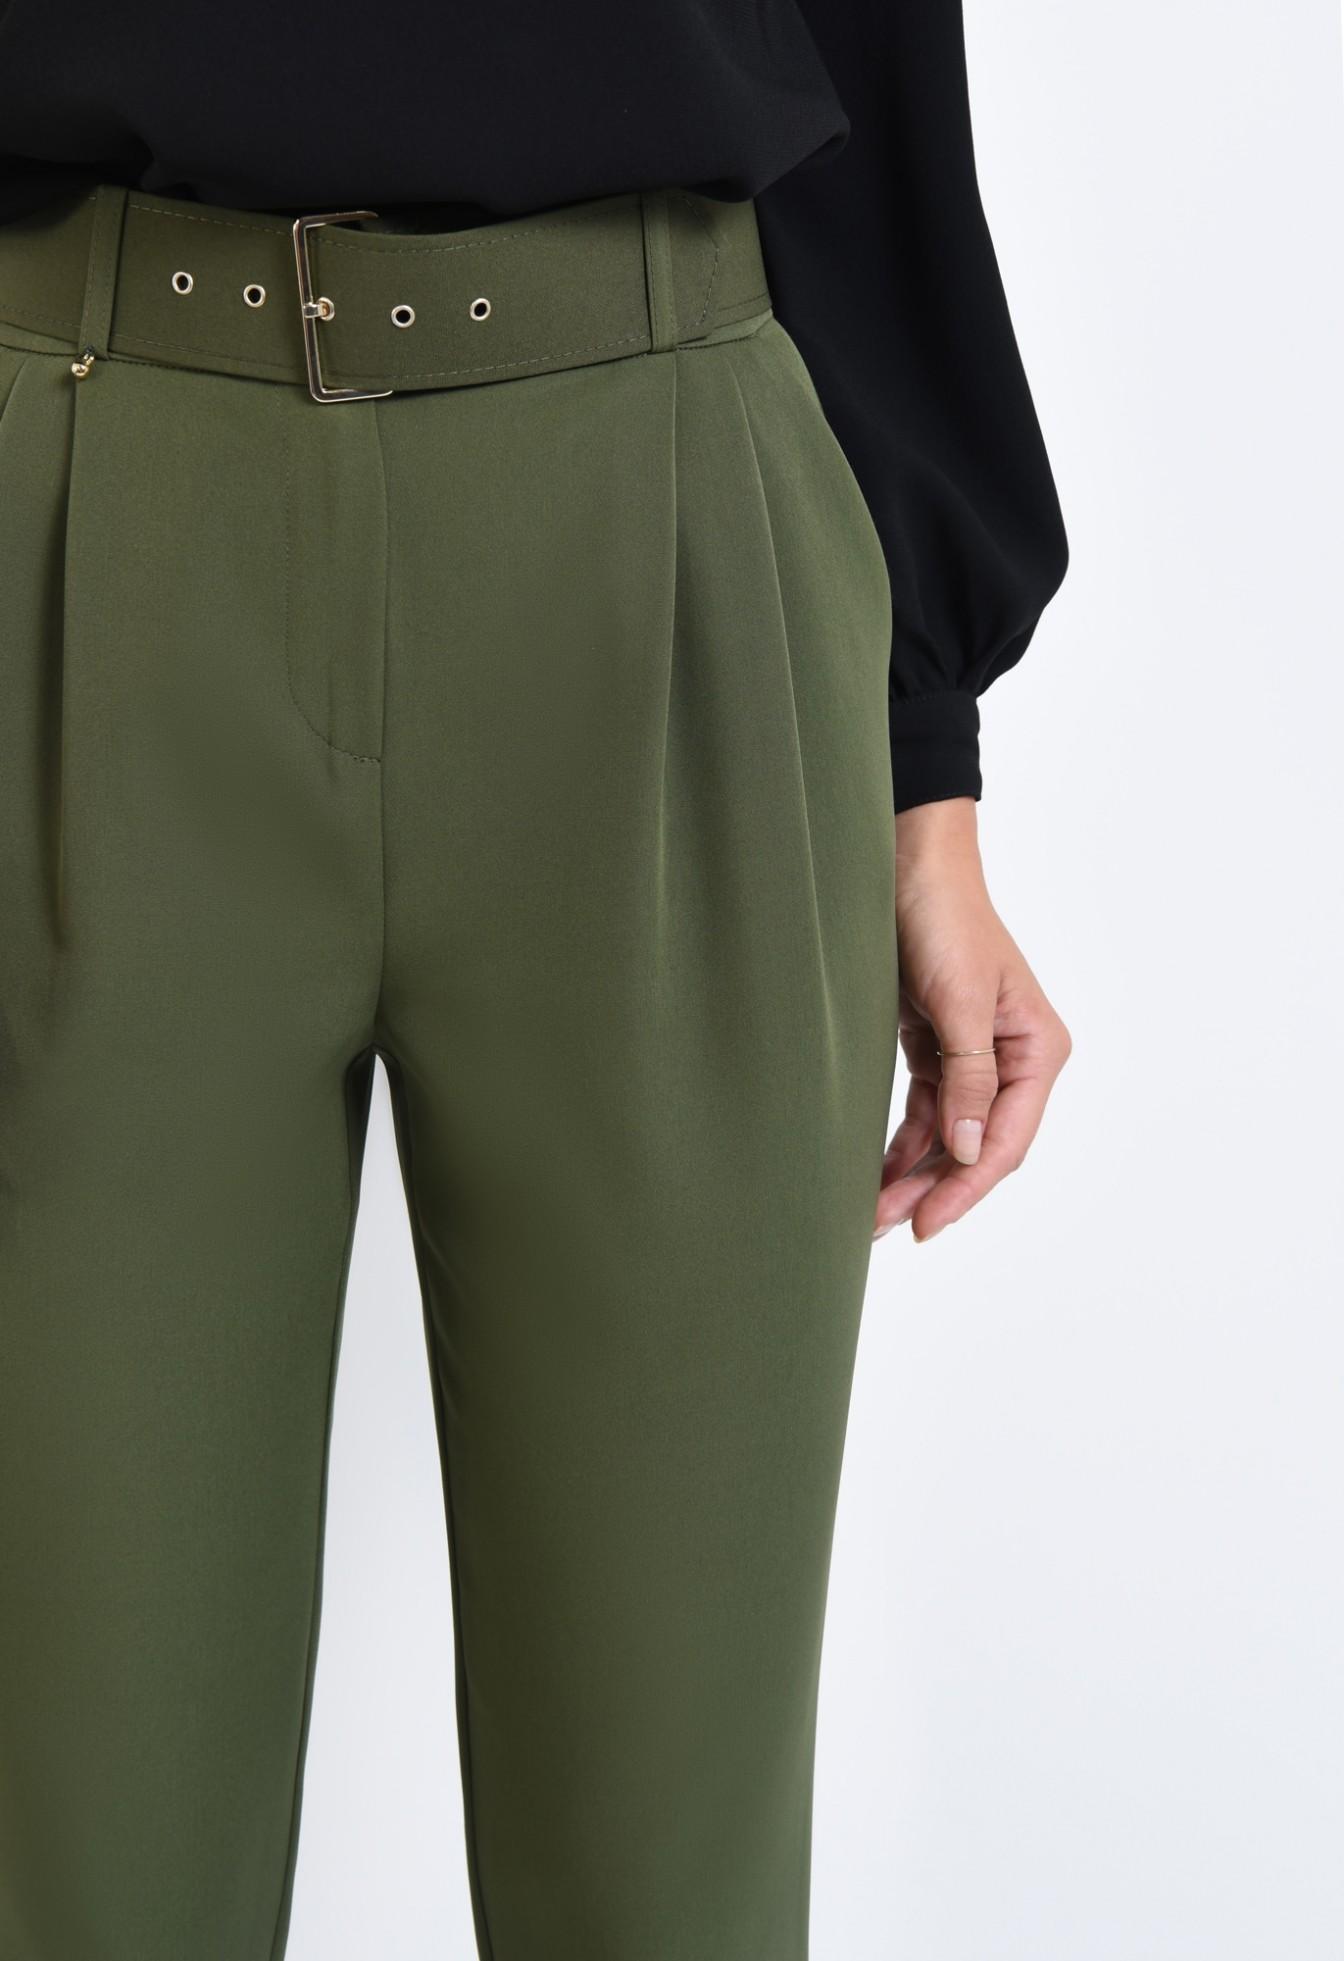 2 - pantaloni de dama, pantaloni online, verde kaki, curea, mansete